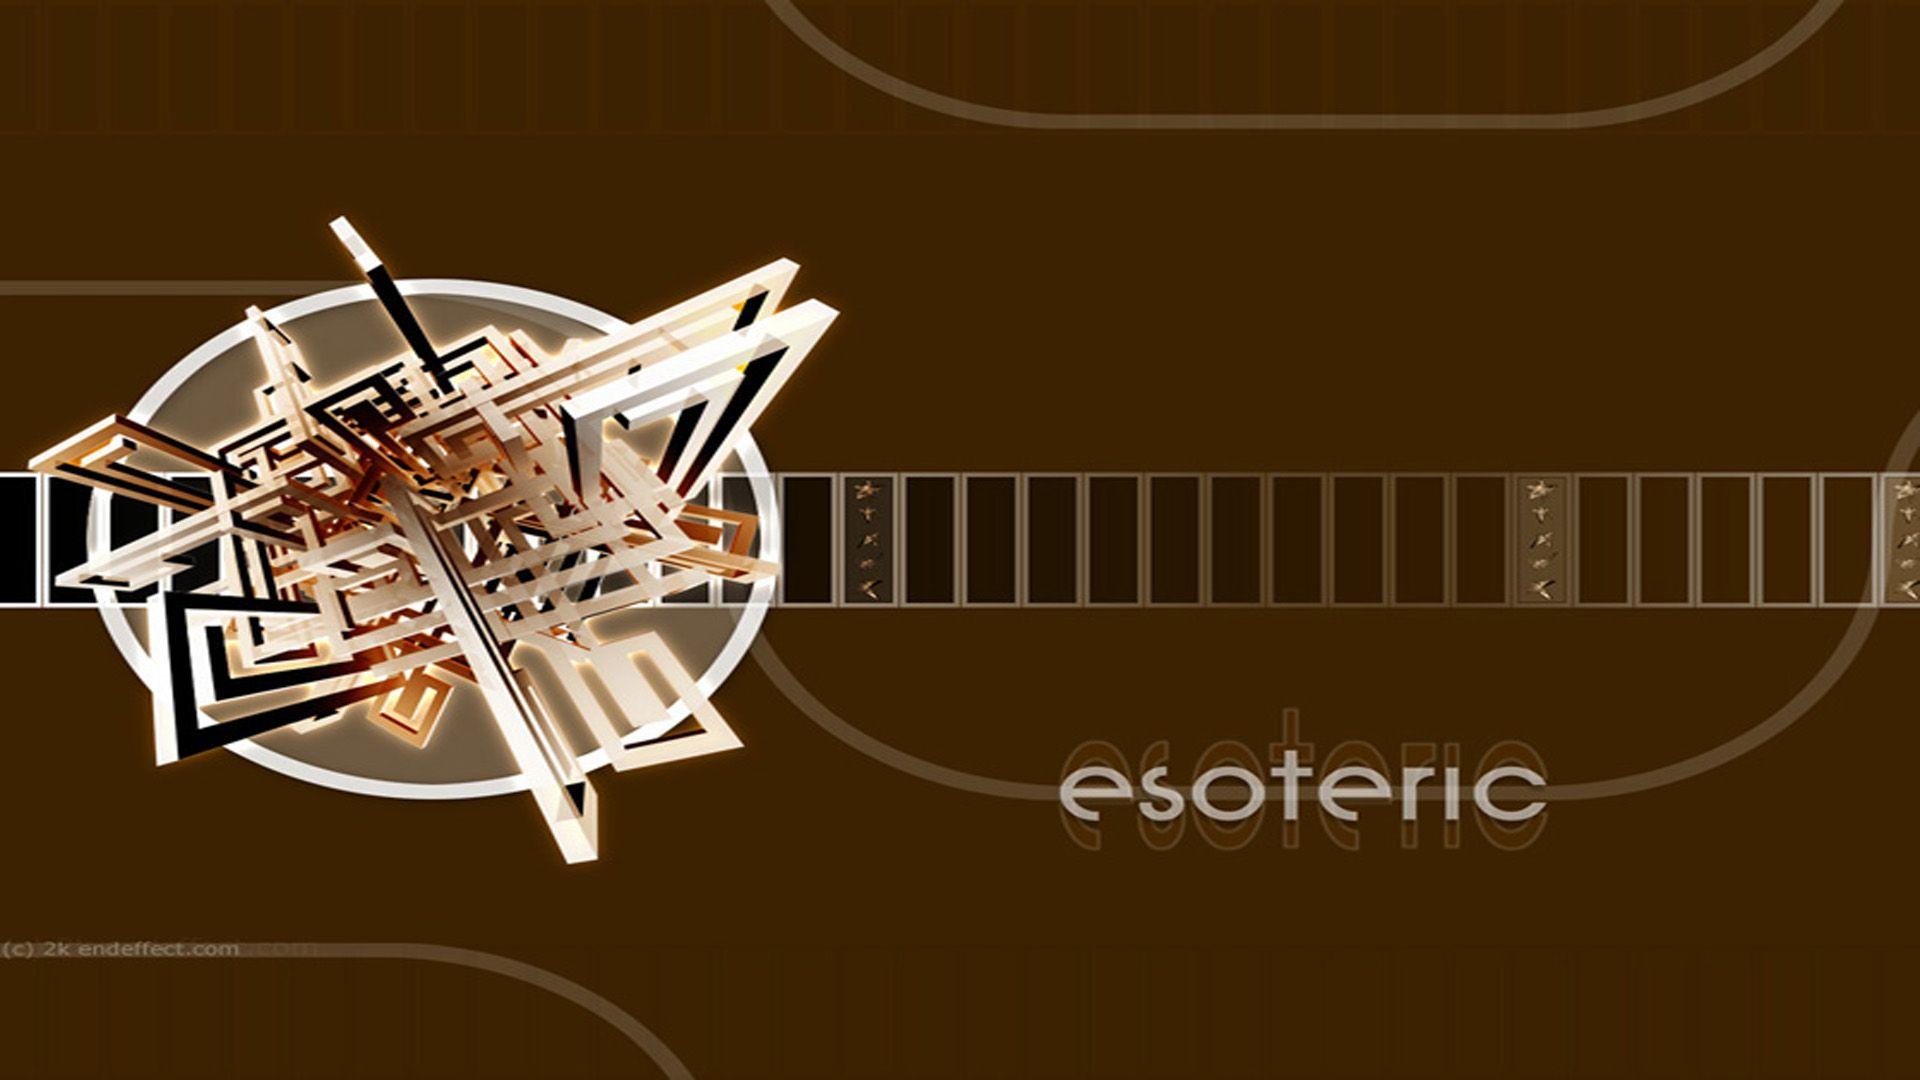 Esoteric[19201080] via Classy Bro